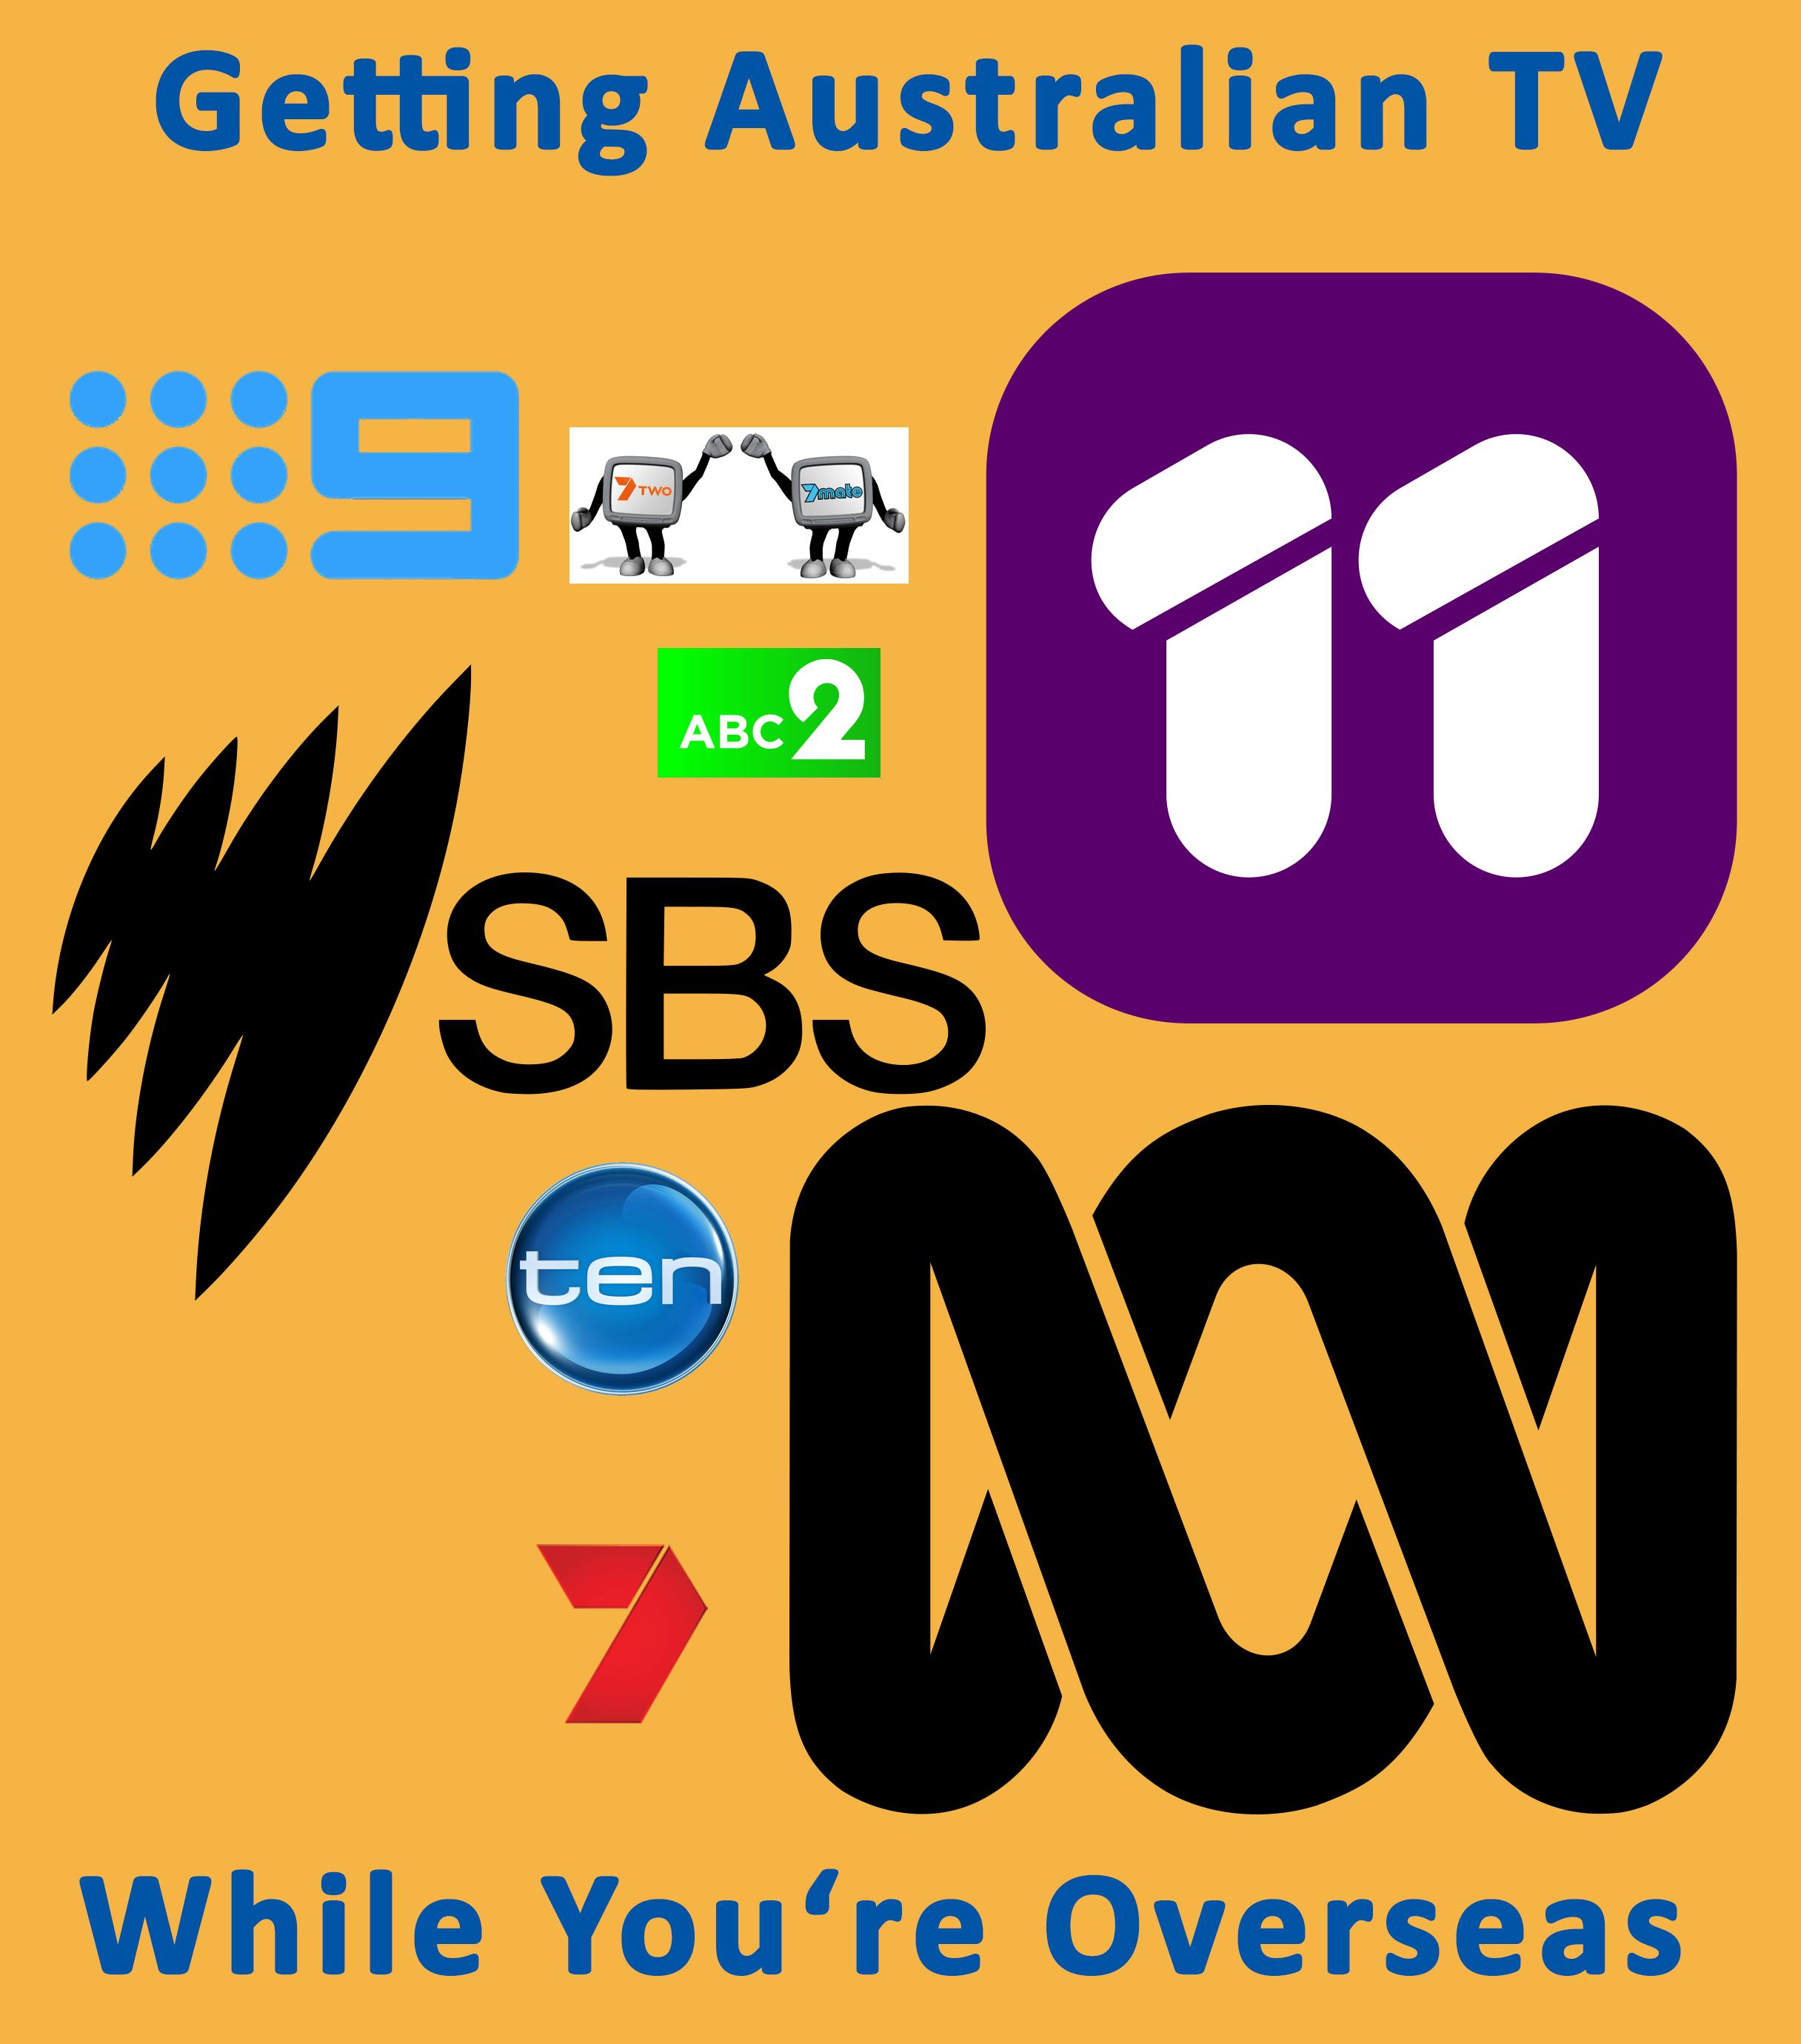 f2d62260780cc81a9ee3d737e2798b5e - How To Get A Us Vpn In Australia